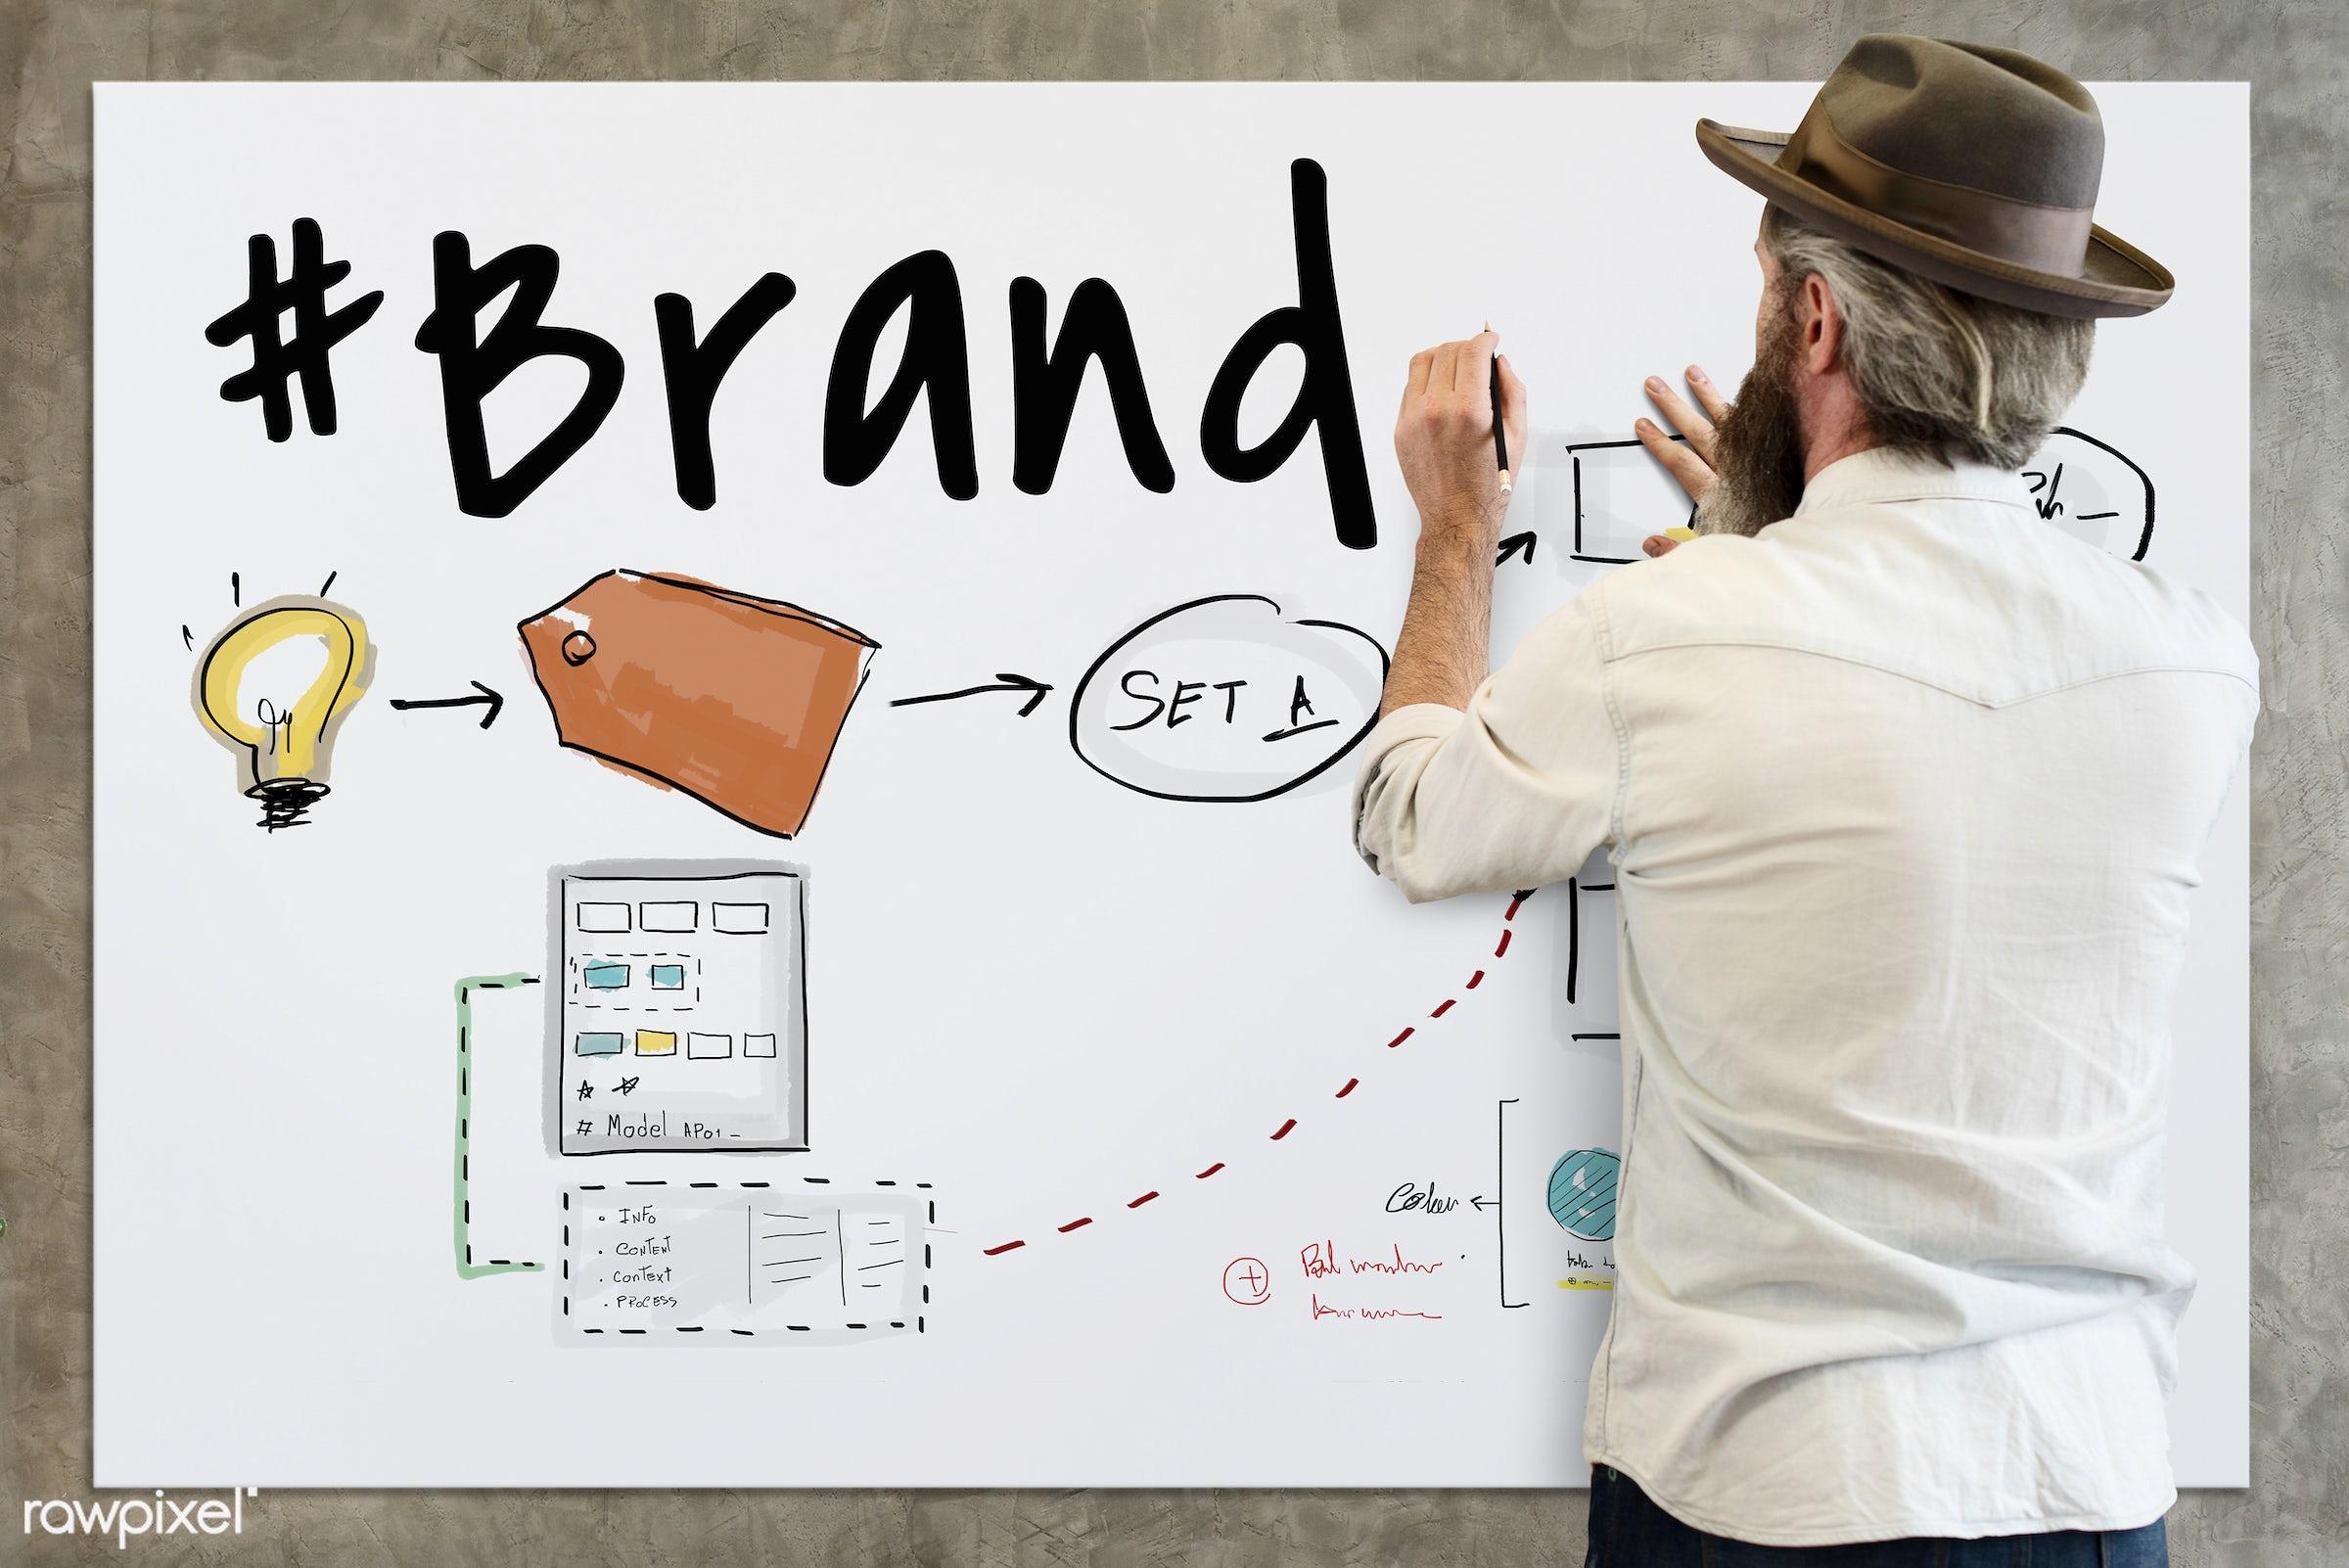 adult, alone, back, be creative, beard, beard guy, board, brainstorm, brand, business, carefree, casual, chart, chill,...